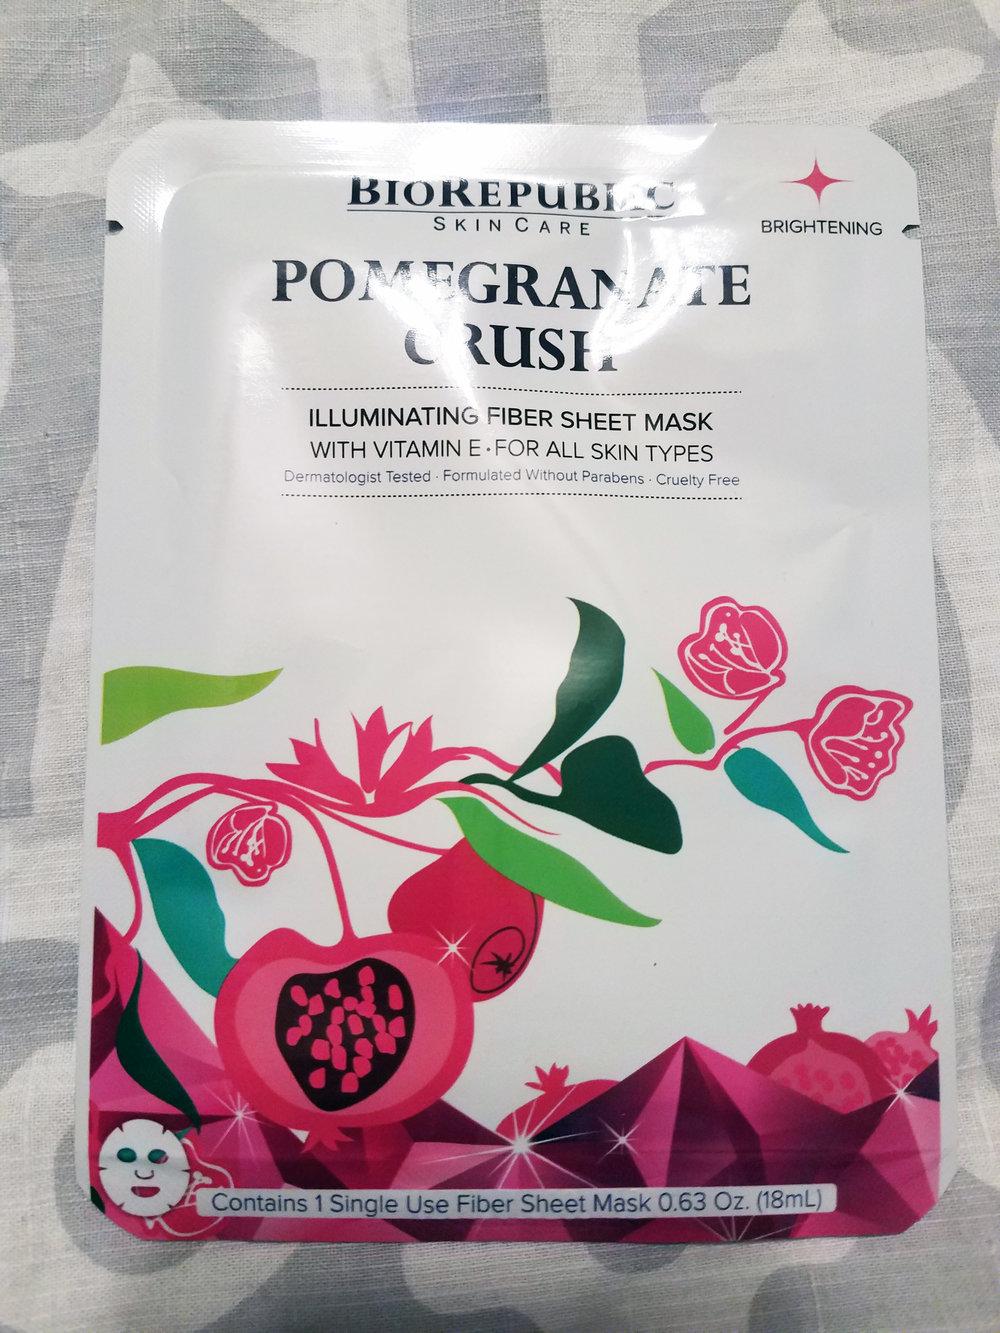 BioRepublic SkinCare Sheet Mask Duo - Pomegranate Crush